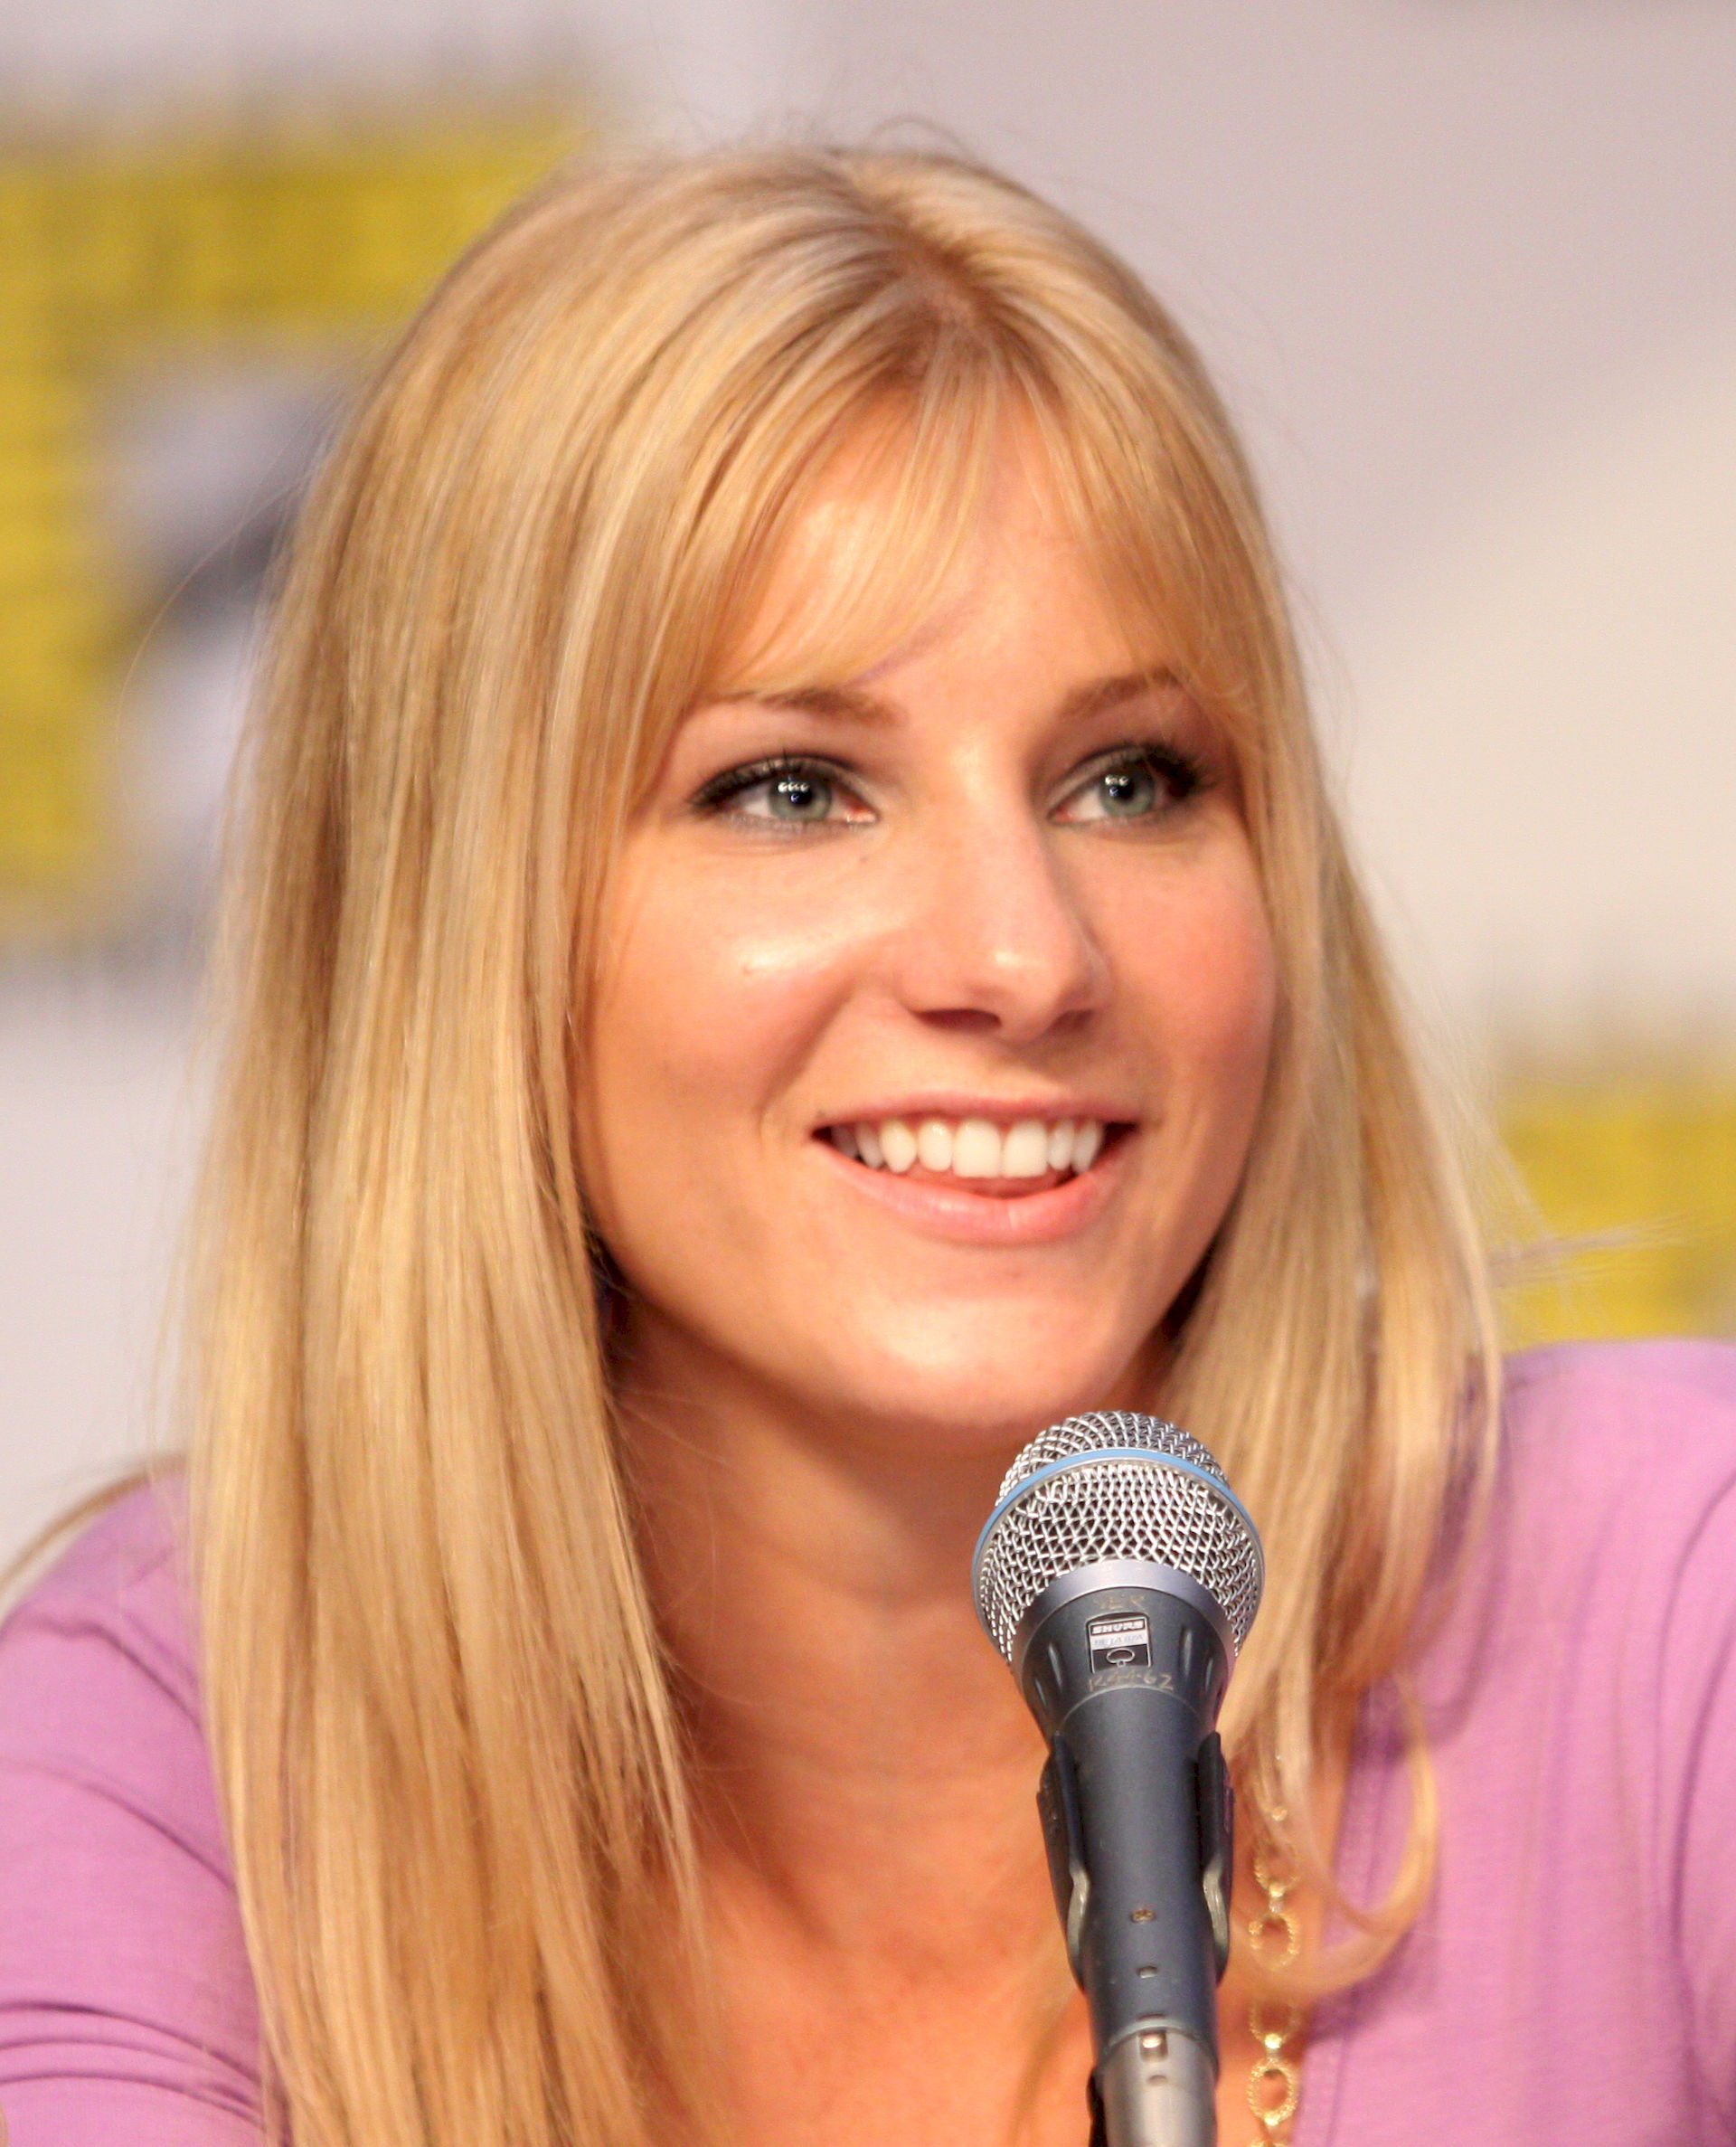 Photo of Heather Morris: Actress, dancer, singer